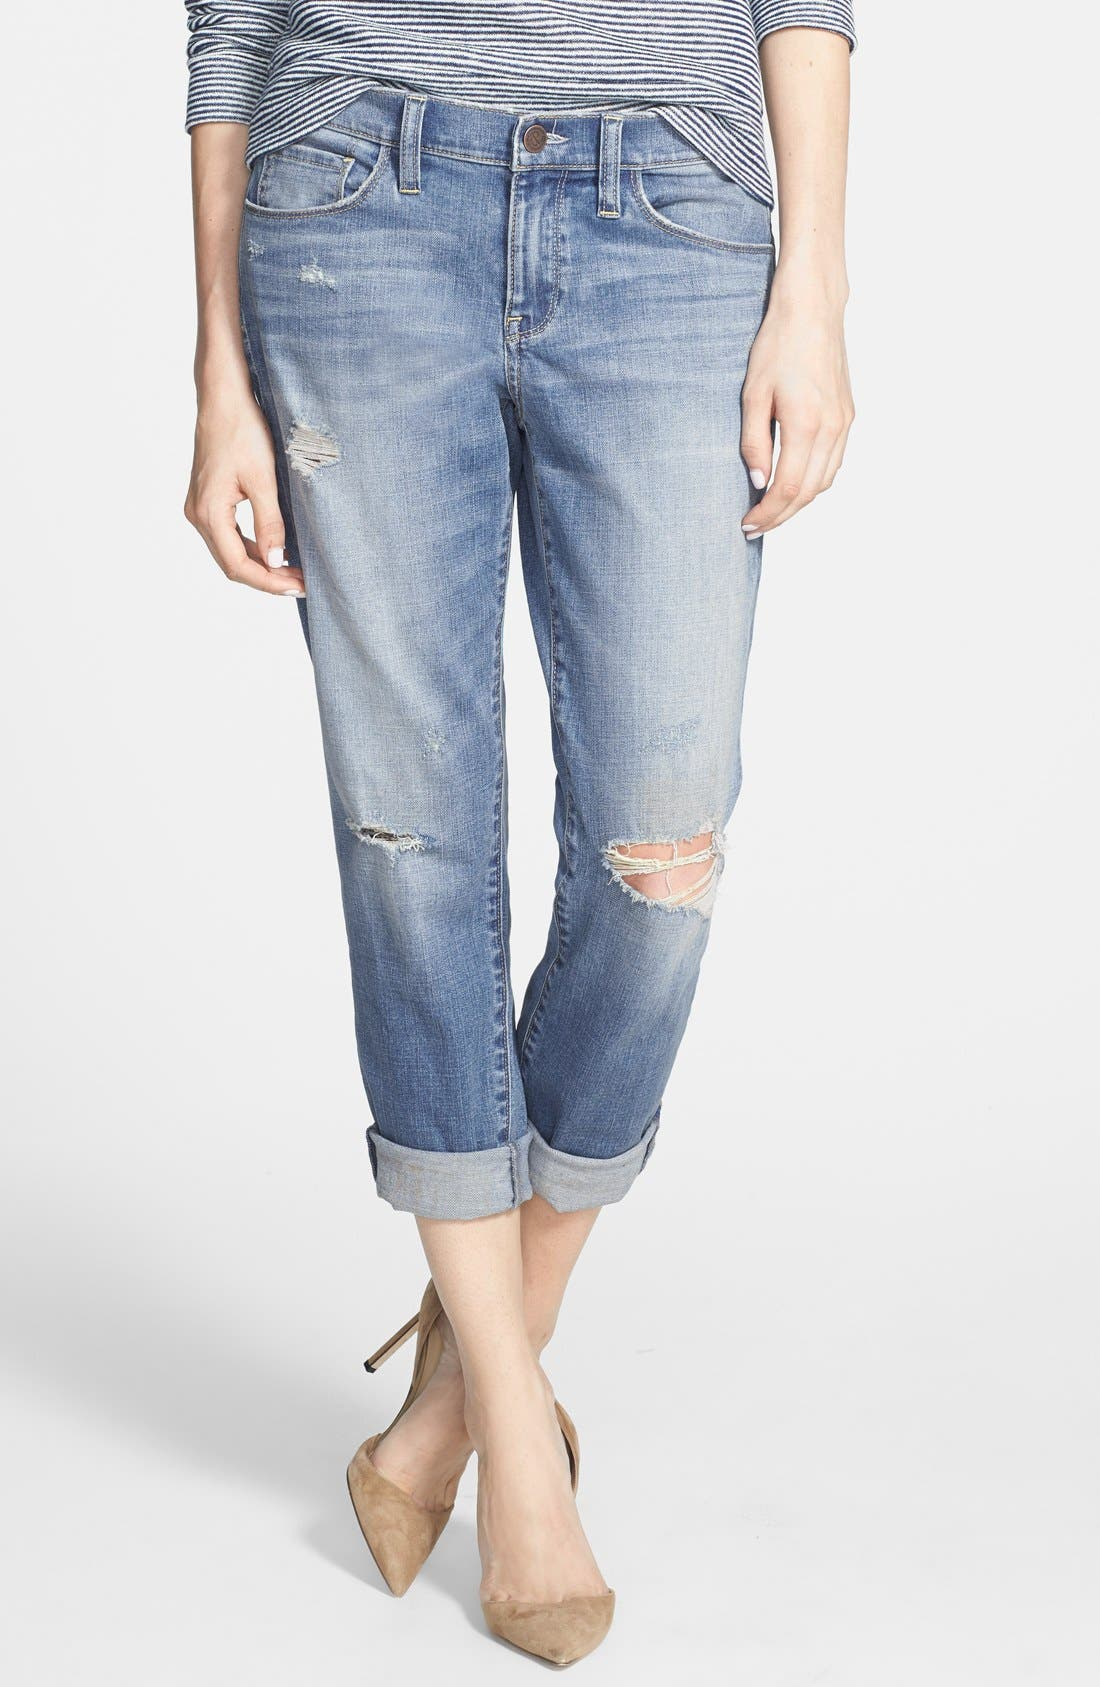 Treasure&Bond Denim Boyfriend Jeans,                         Main,                         color, 400